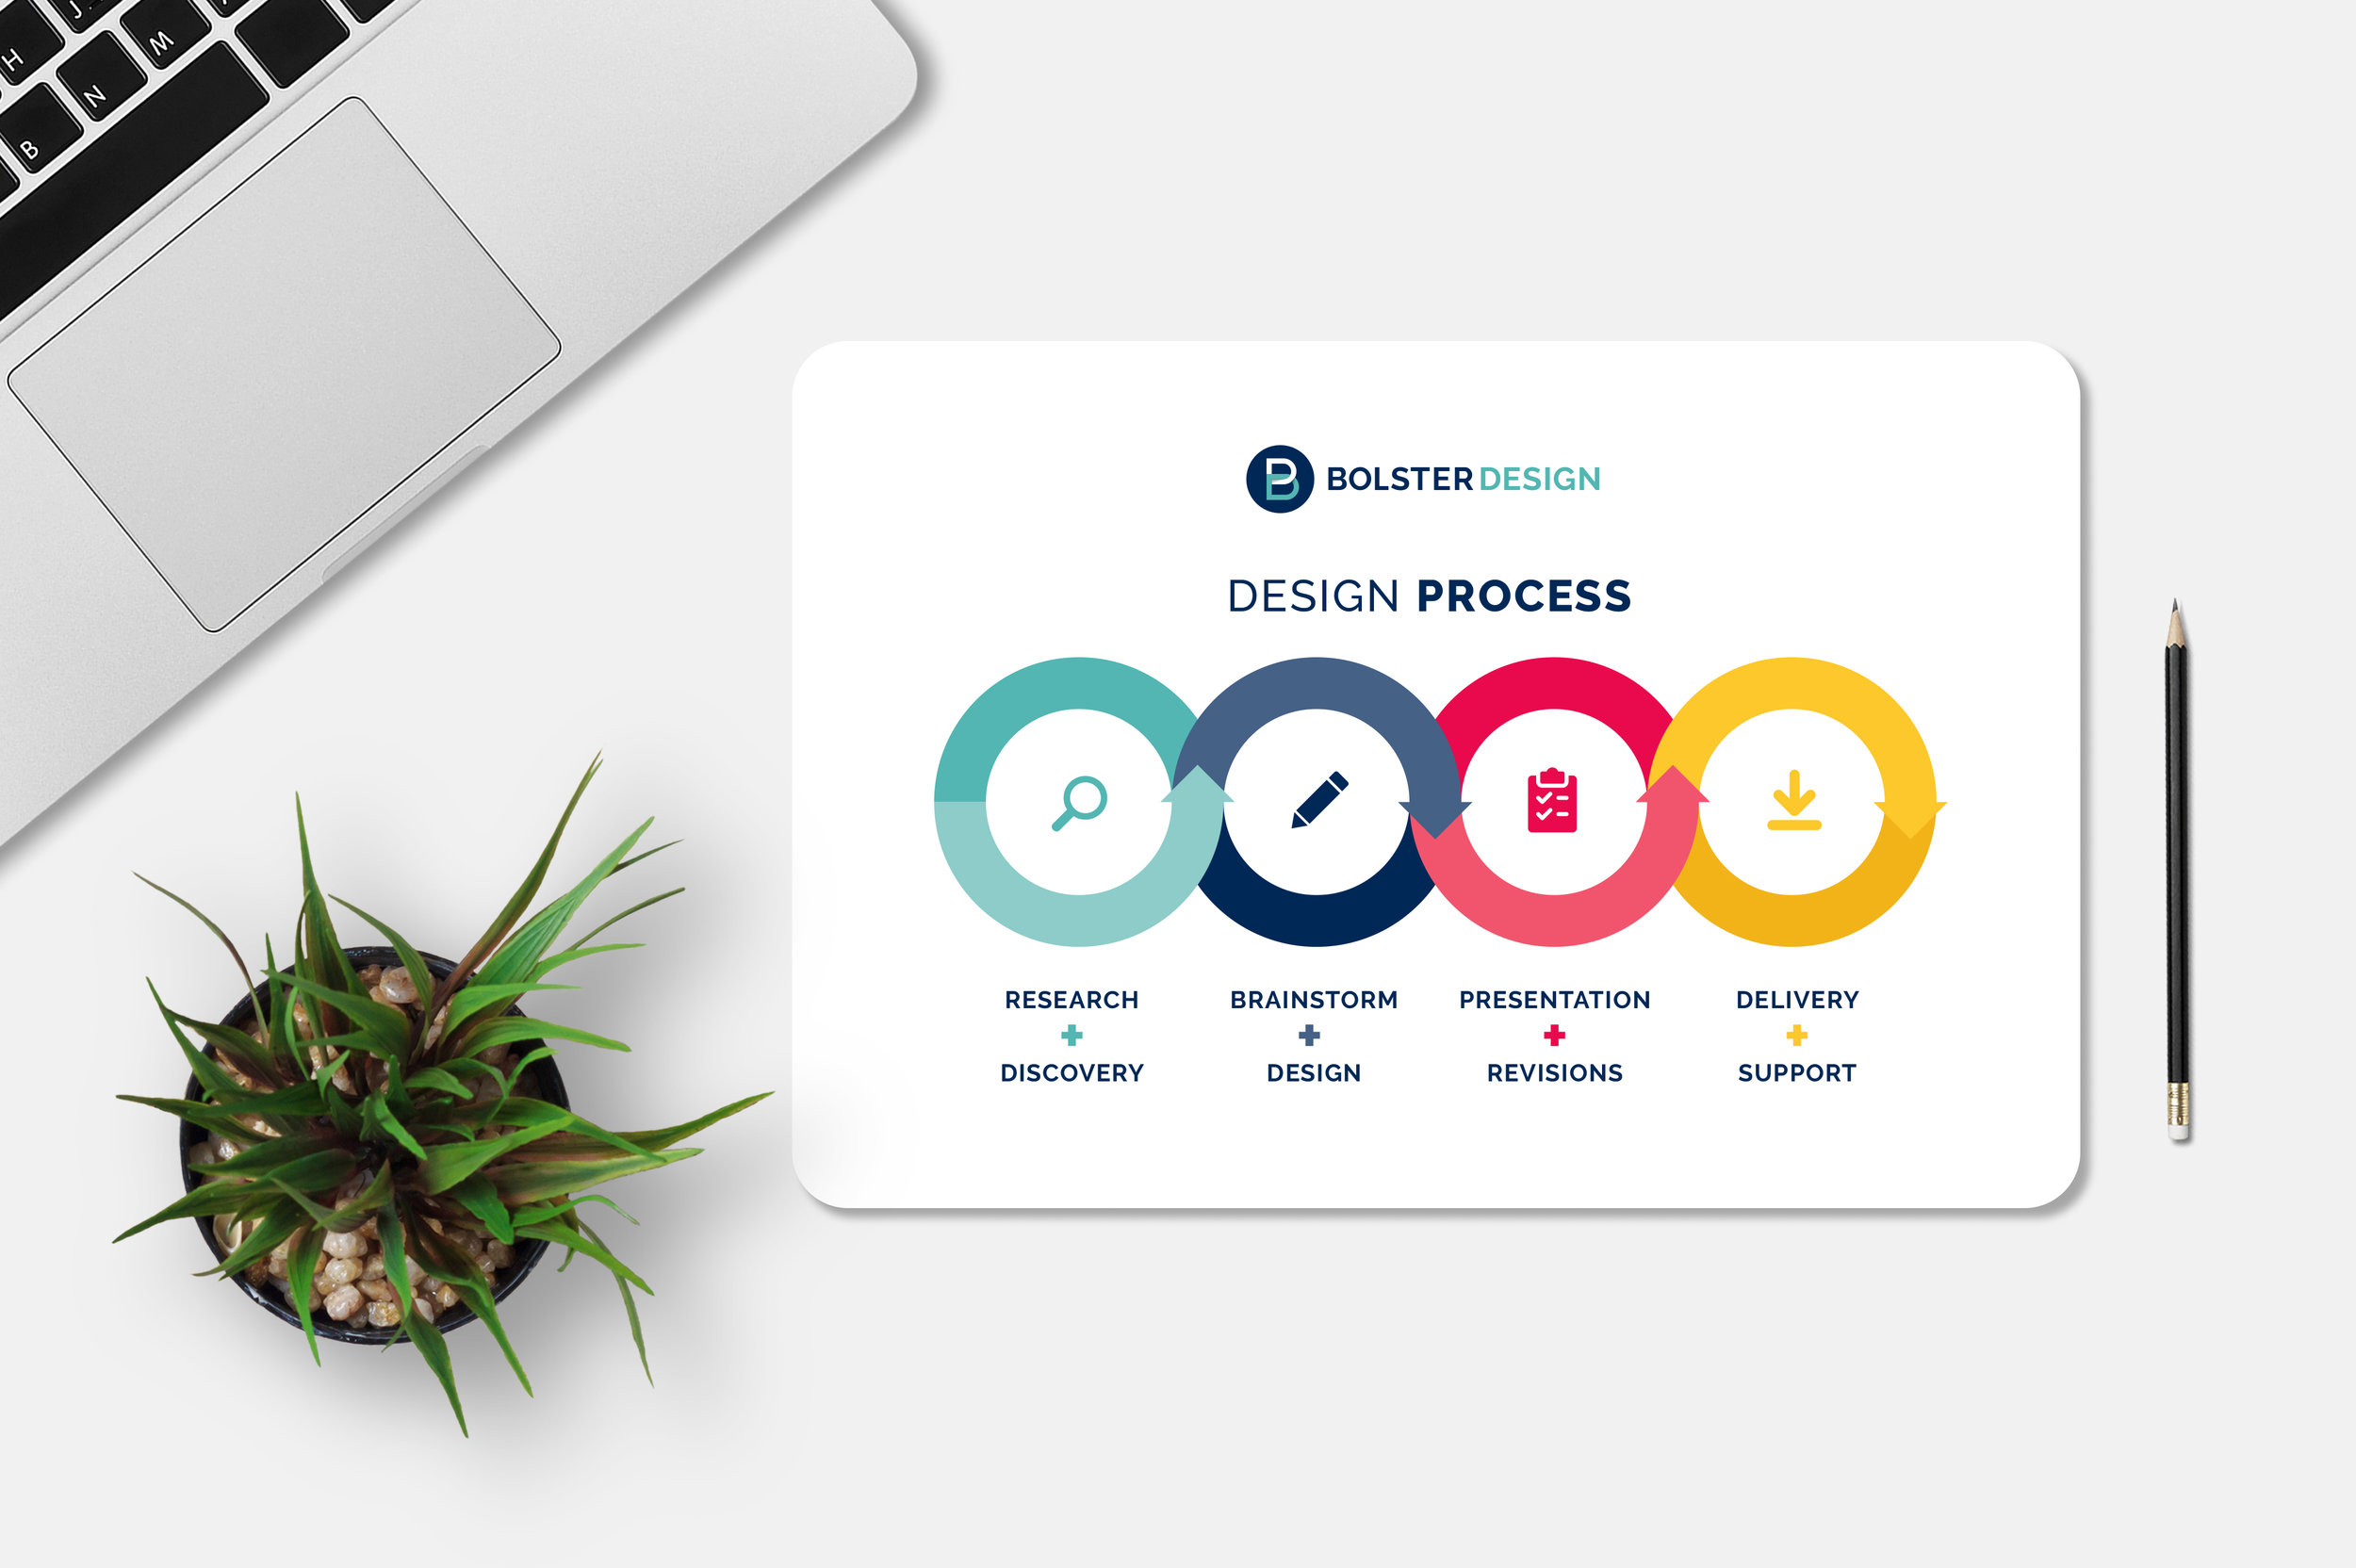 Bolster Design Design Process